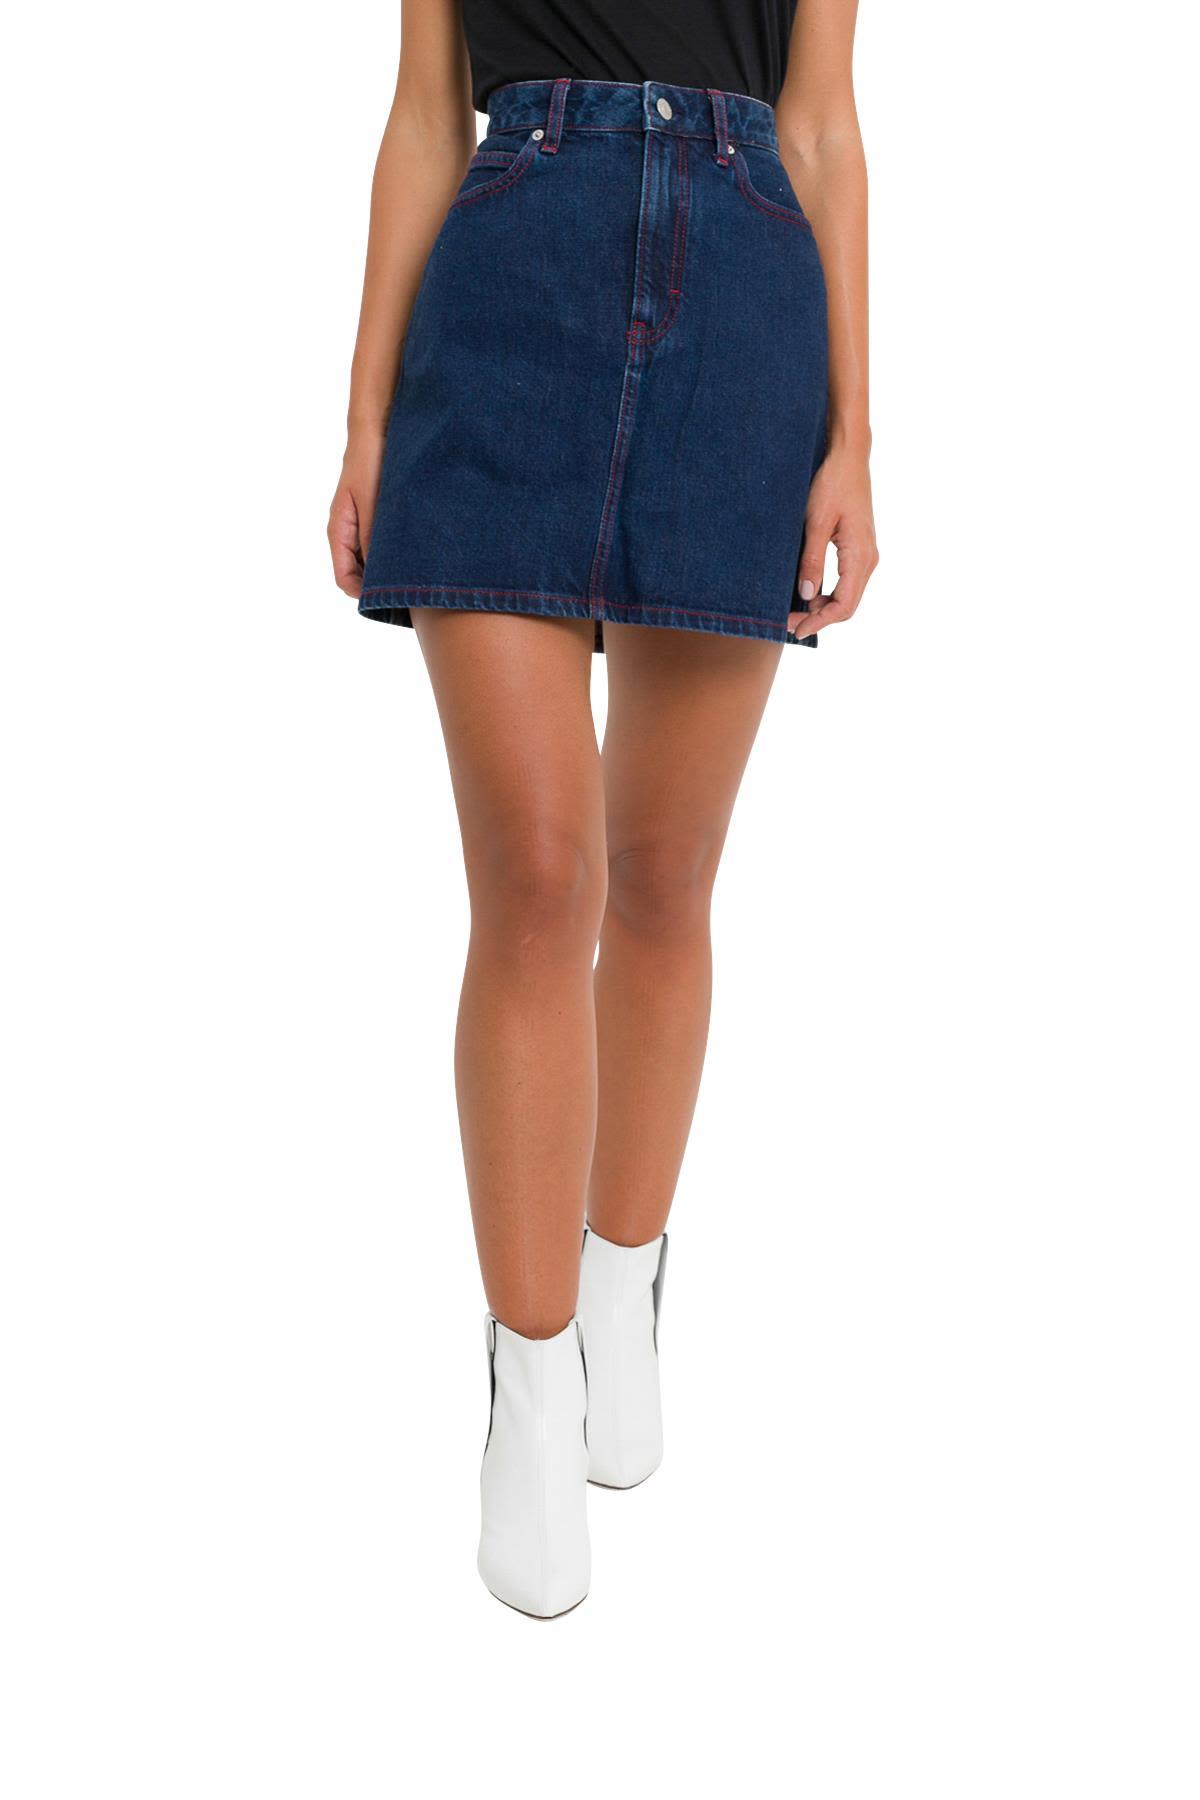 Calvin Klein Jeans Contrasting Color Stitch Denim Miniskirt